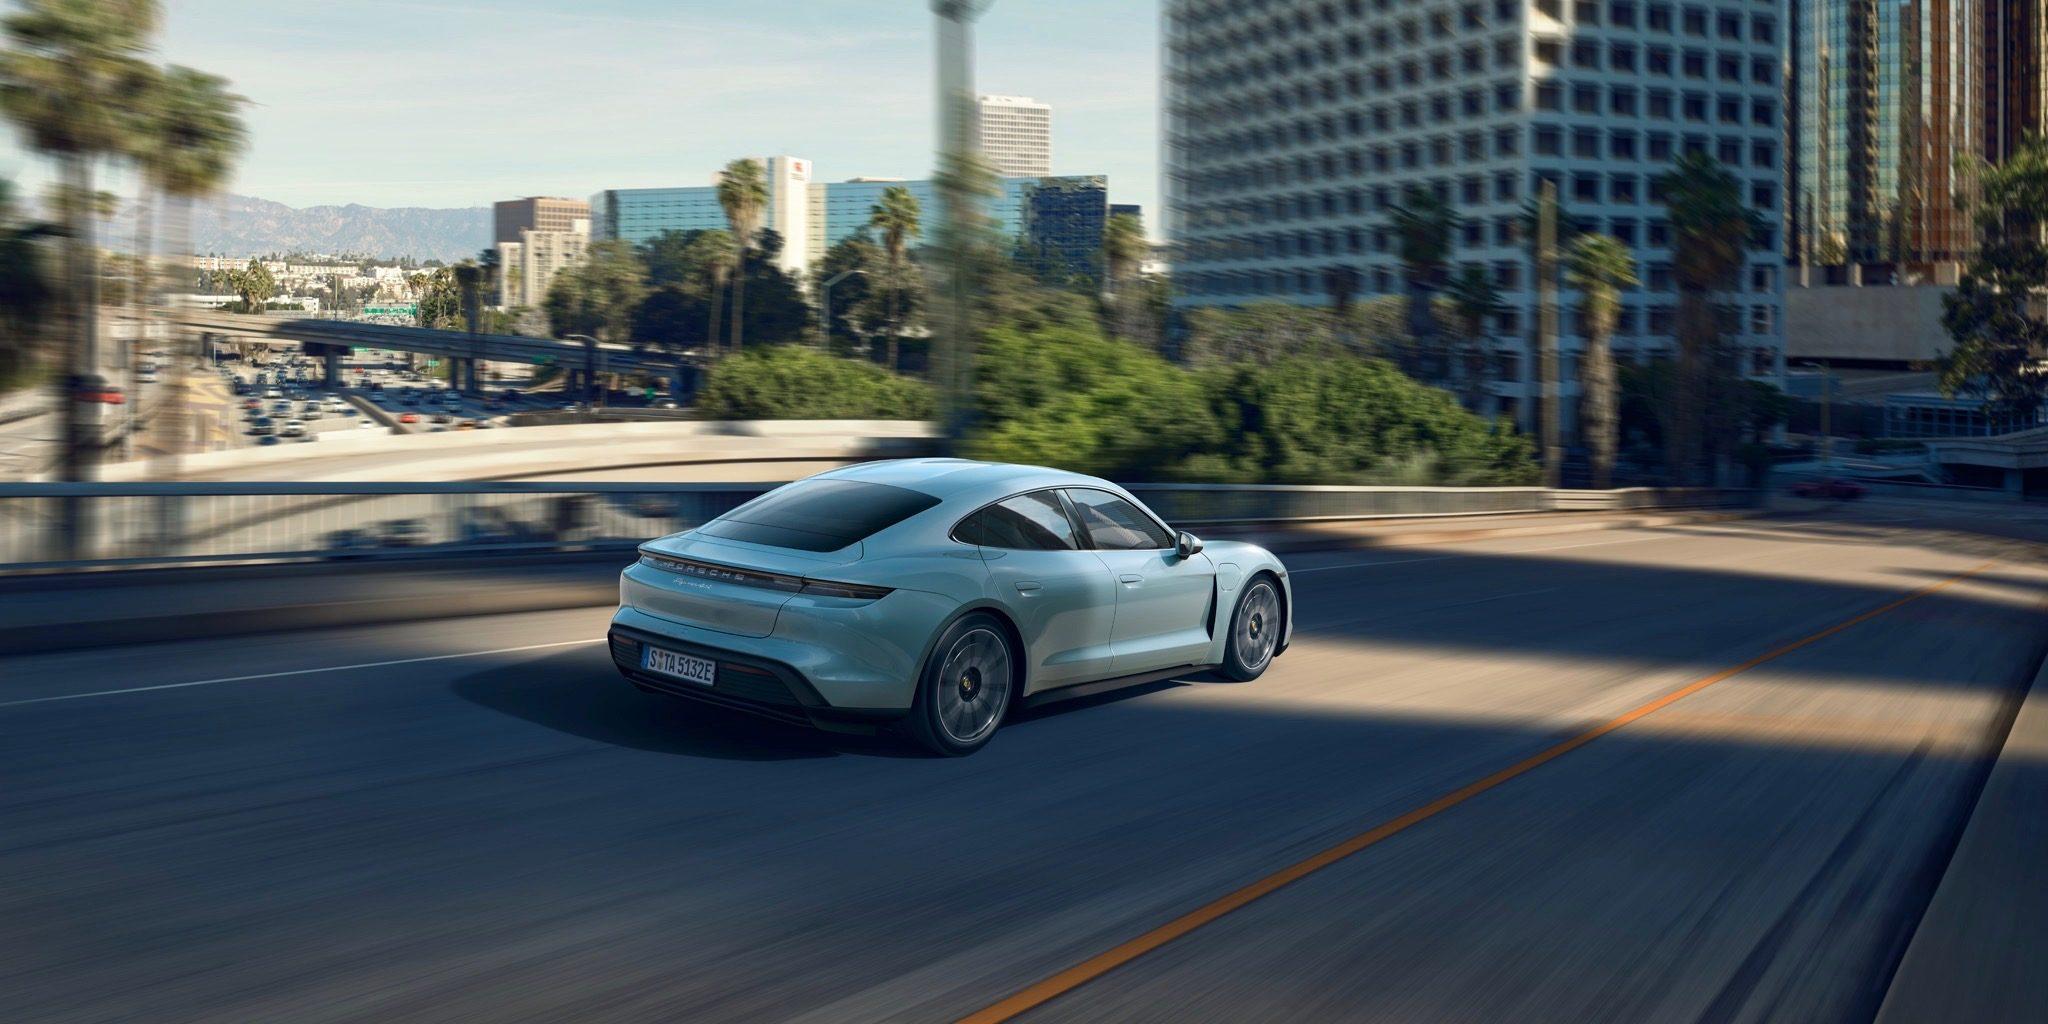 Porsche Taycan Turbo S is new least,efficient EV 68 MPGe